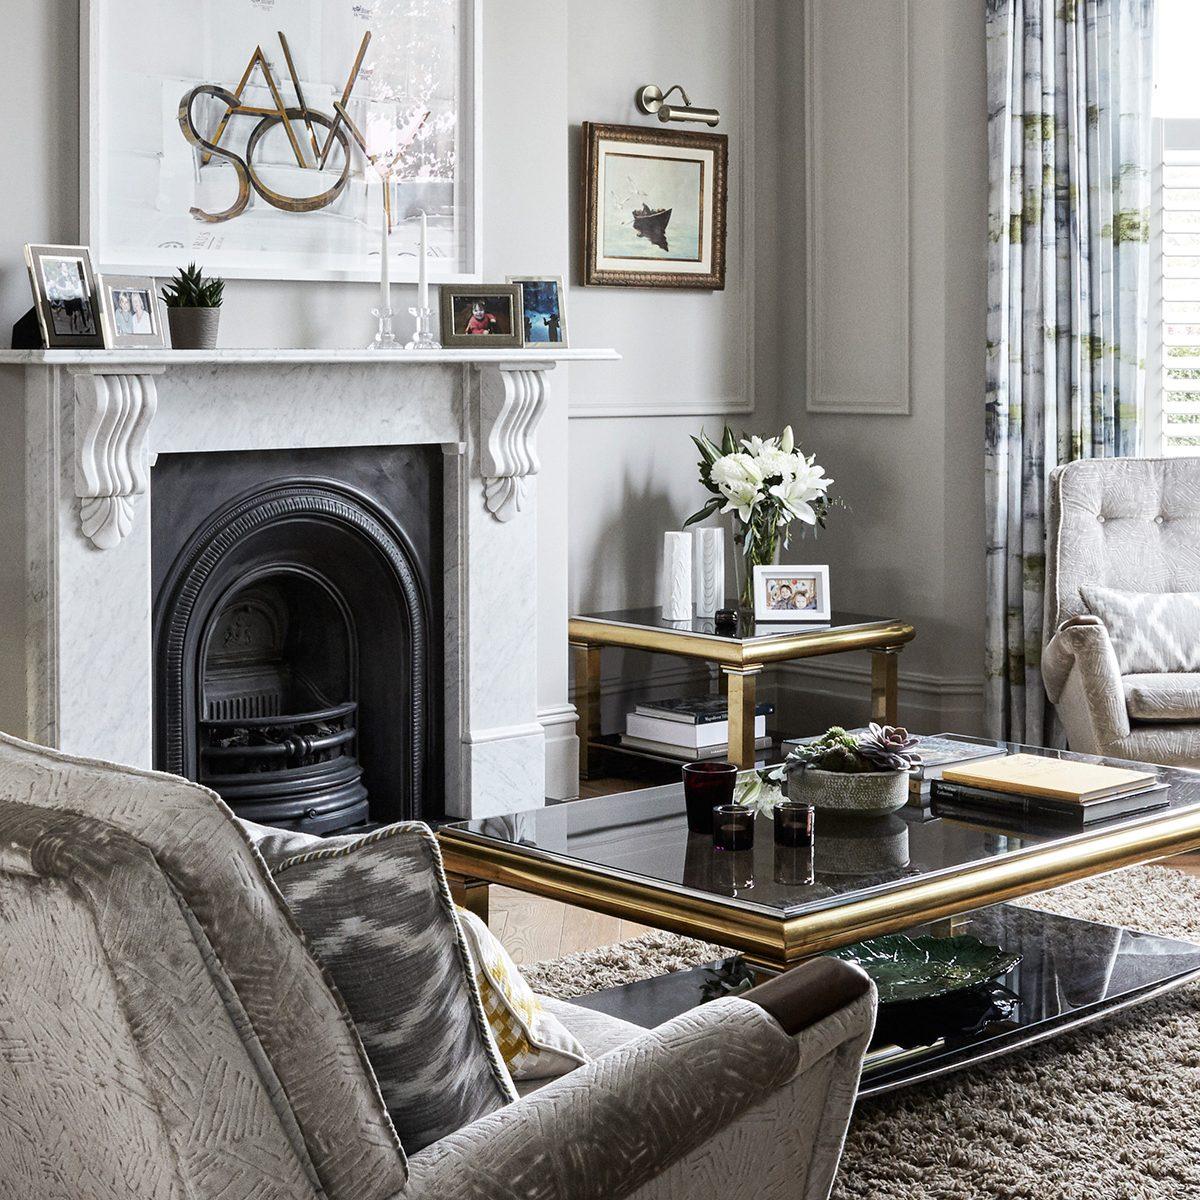 Grey living room ideas – Living room ideas in shades of grey